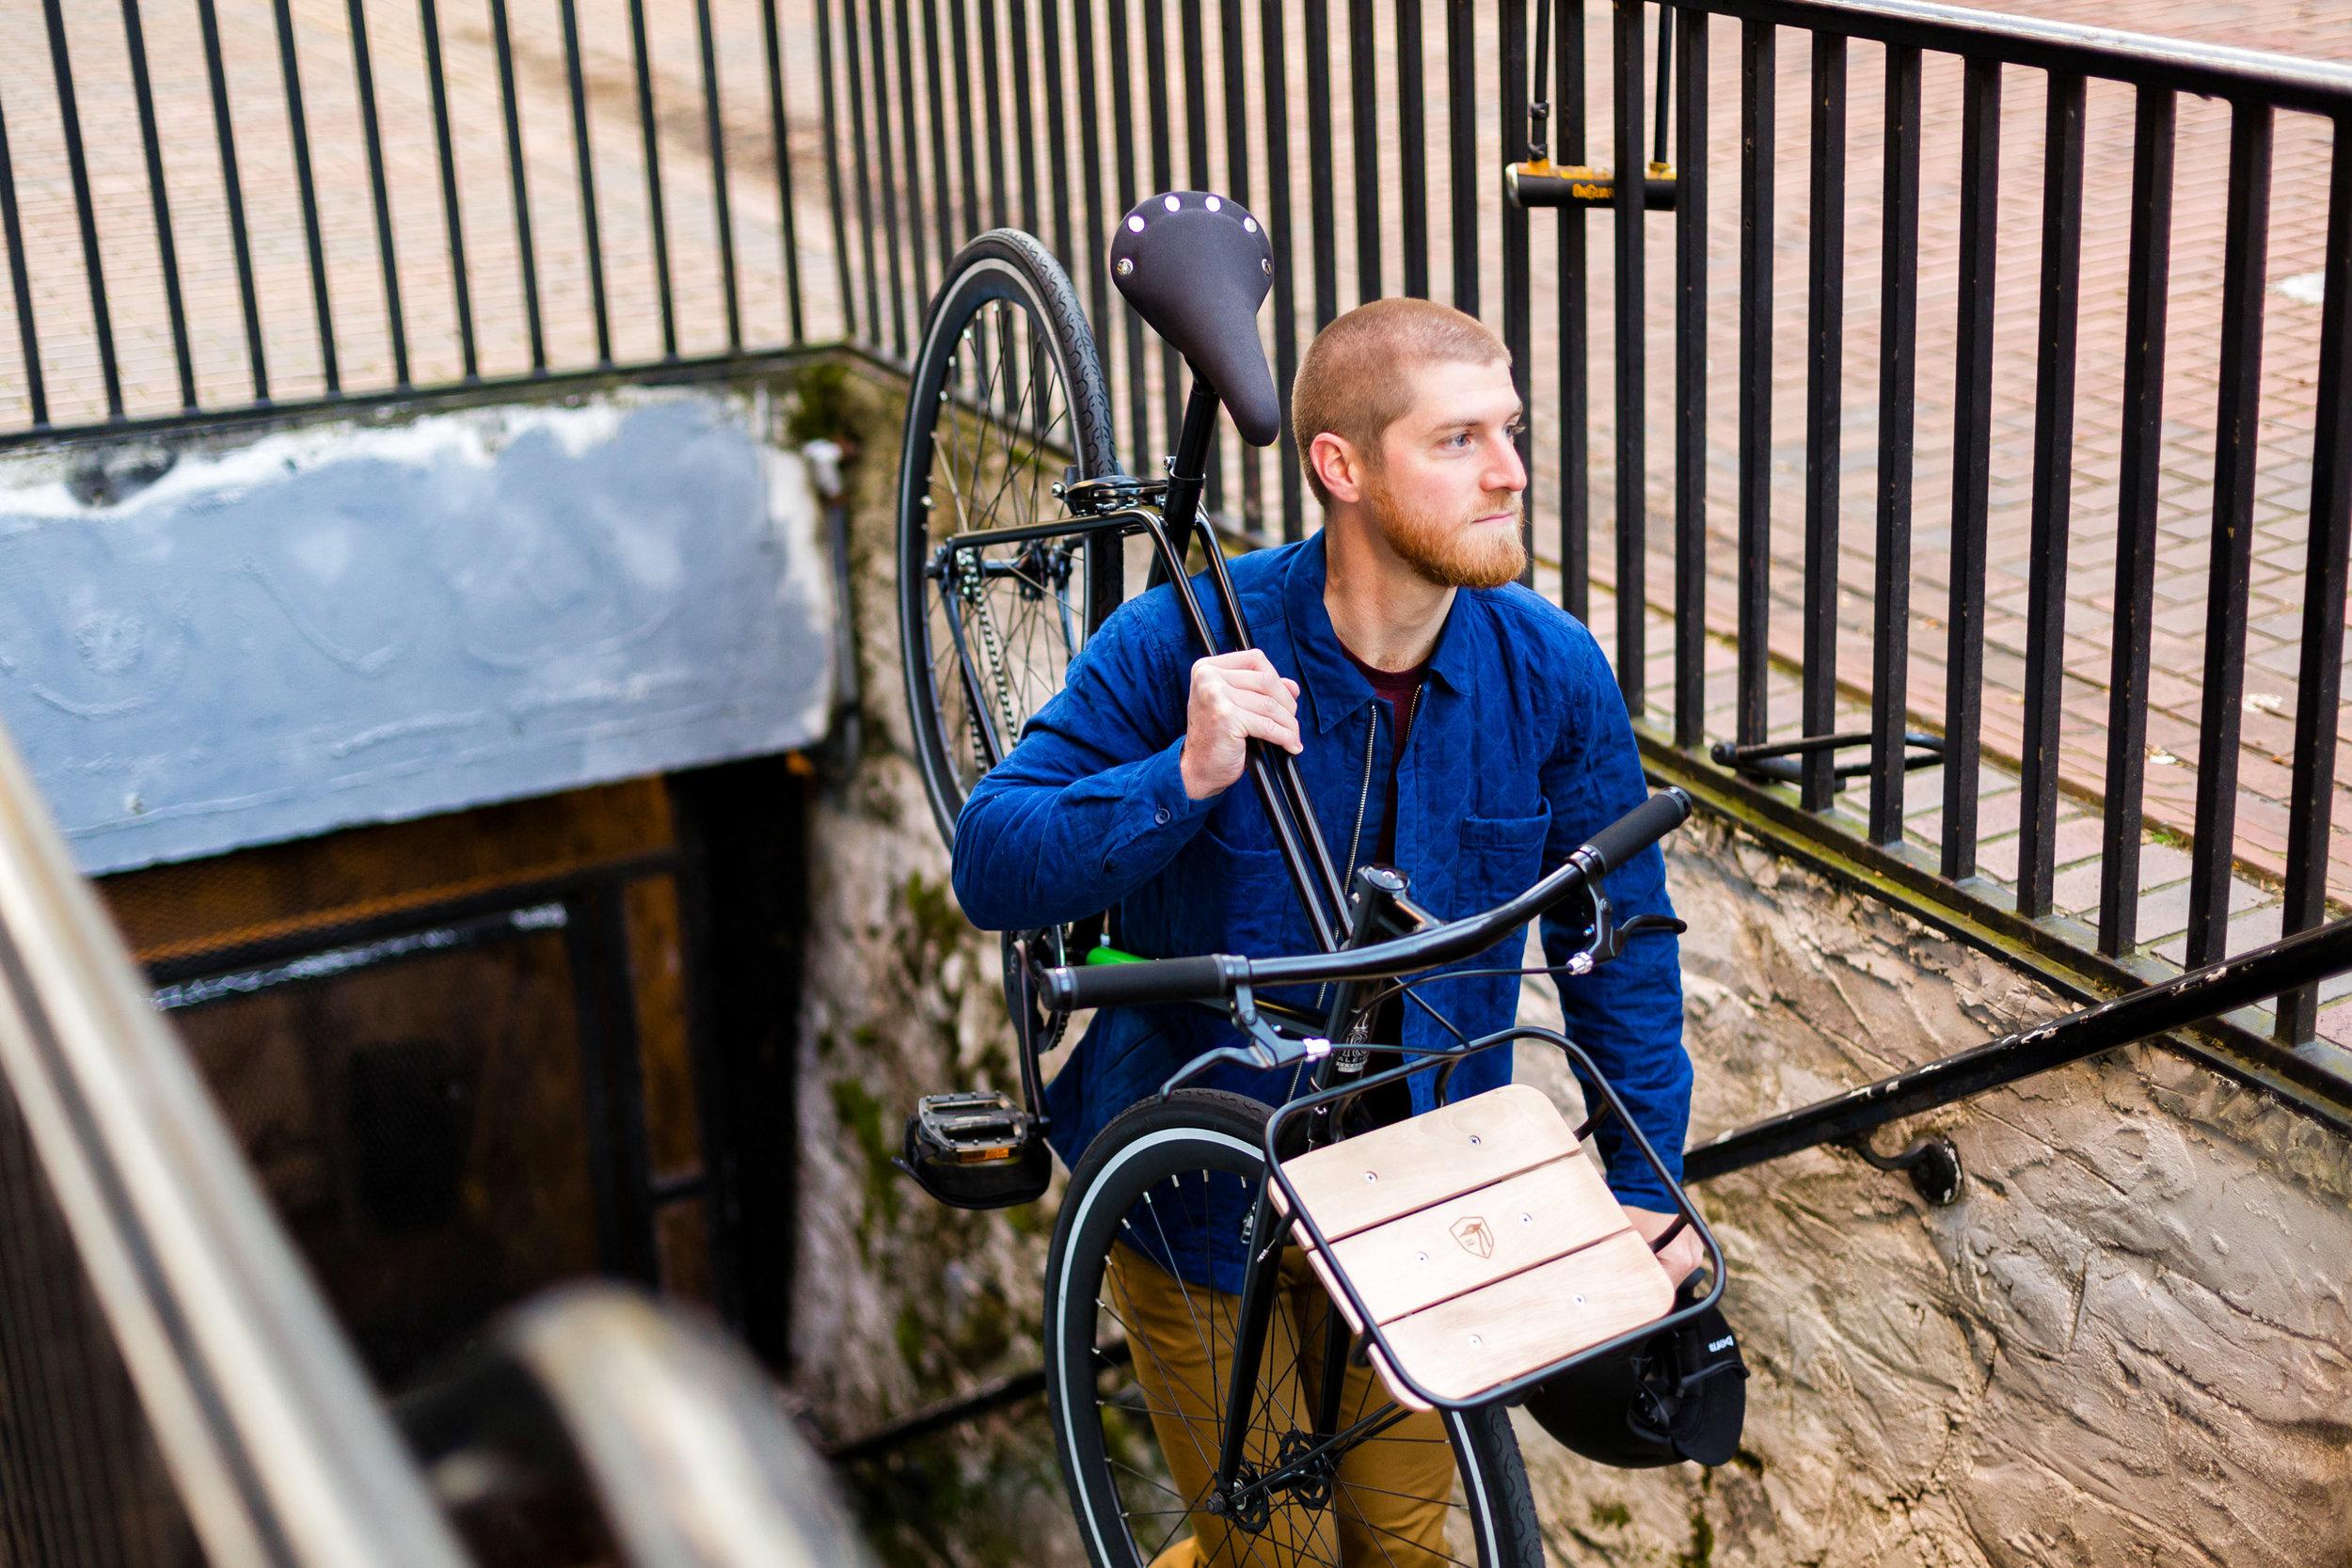 Lifestyle: Urban lifestyle and biking in Pioneer Square, downtown Seattle, Washington